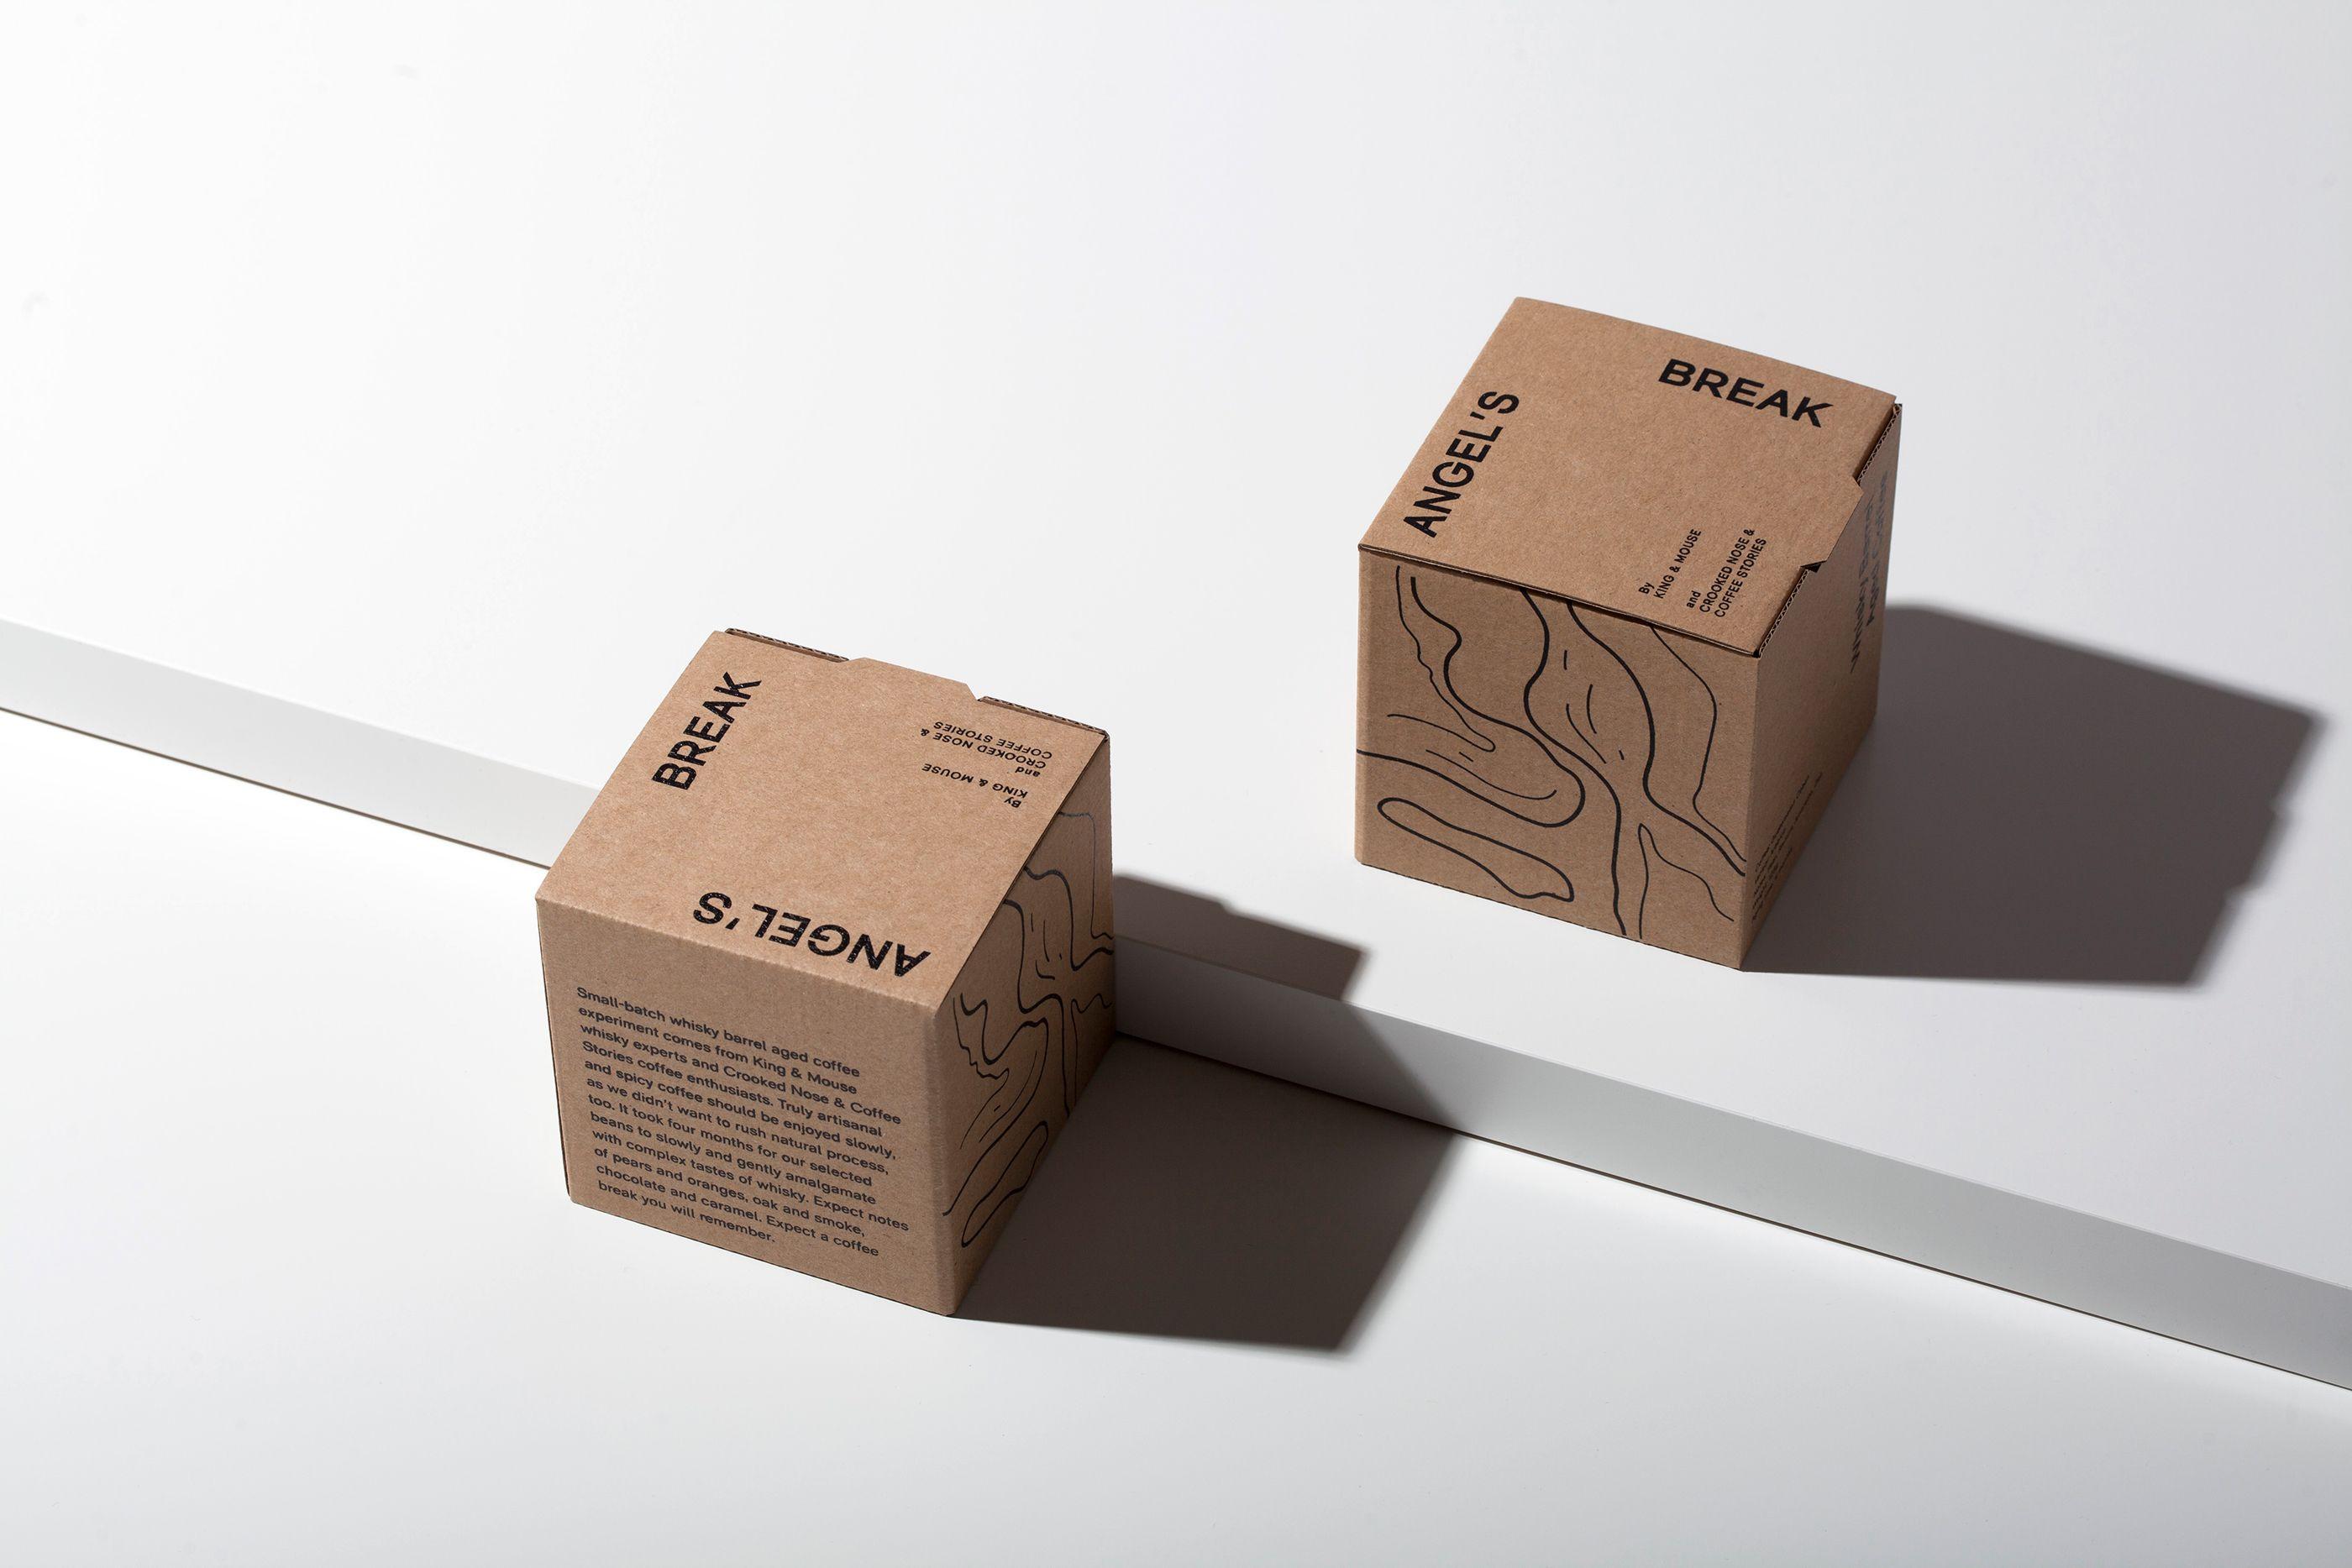 ANGEL'S BREAK coffee beans packaging on Behance